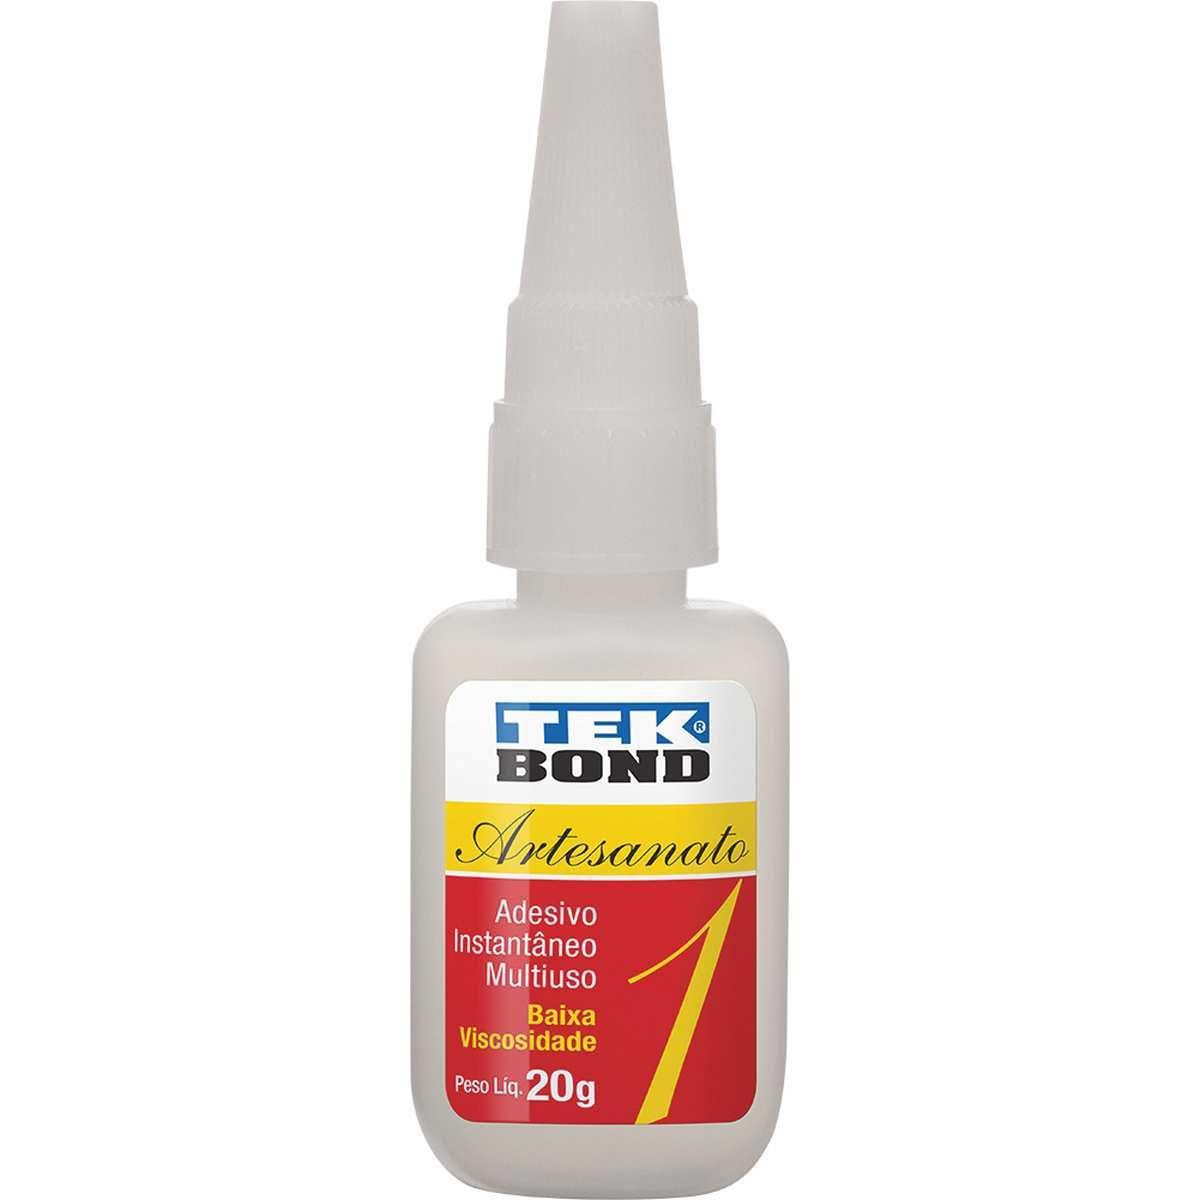 Cola adesivo instantâneo - Artesanado 1 - 20g - Tekbond